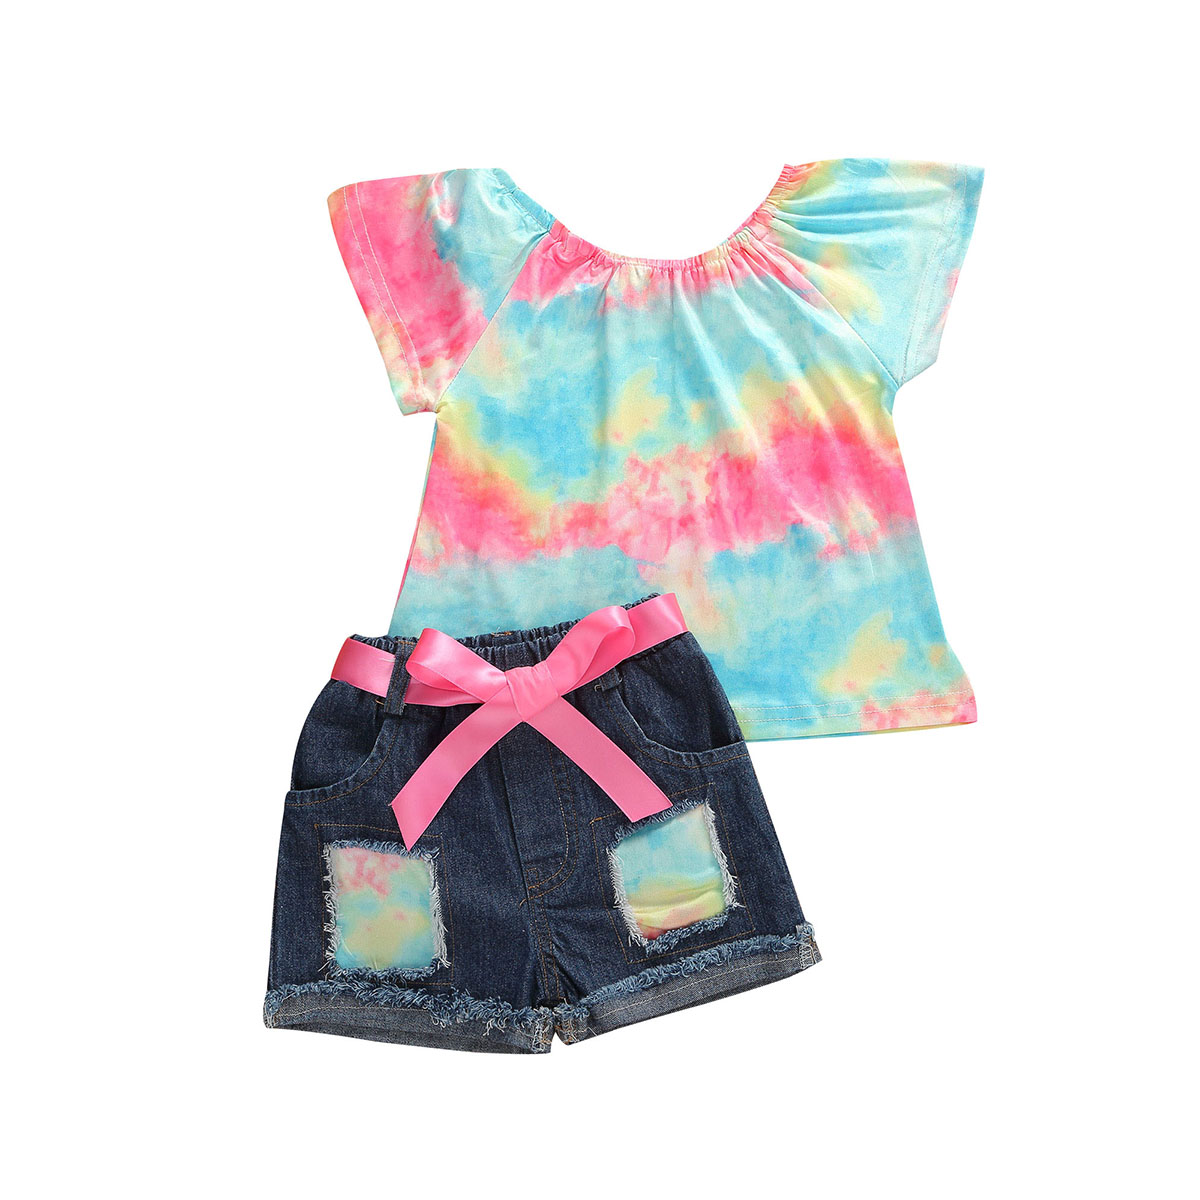 1-6Y Summer Baby Girls Clothing Sets Rainbow Print Ruffles Sleeve T Shirts Tops + Denim Blue Shorts 2pcs